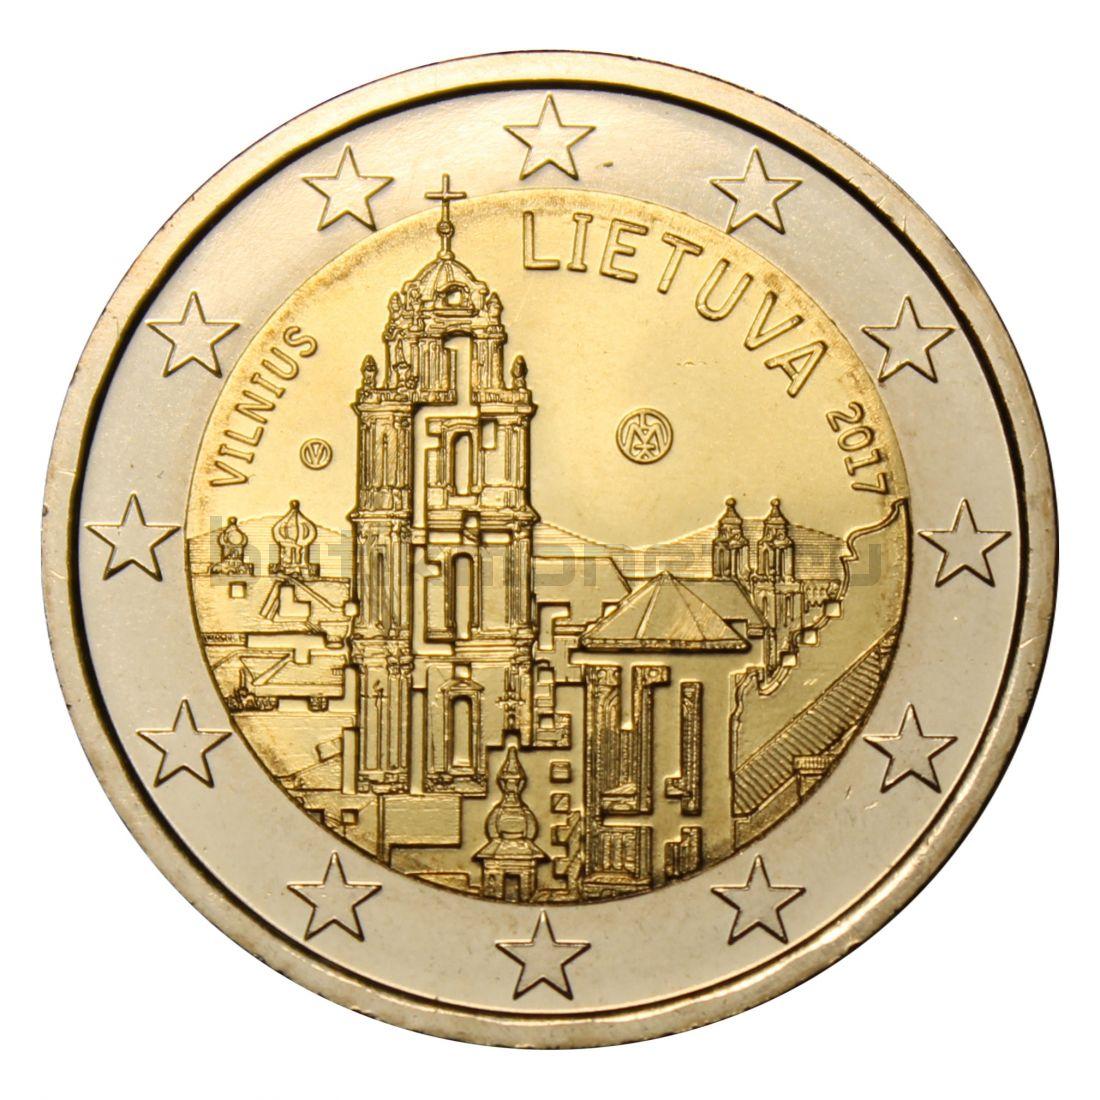 2 евро 2017 Литва Вильнюс